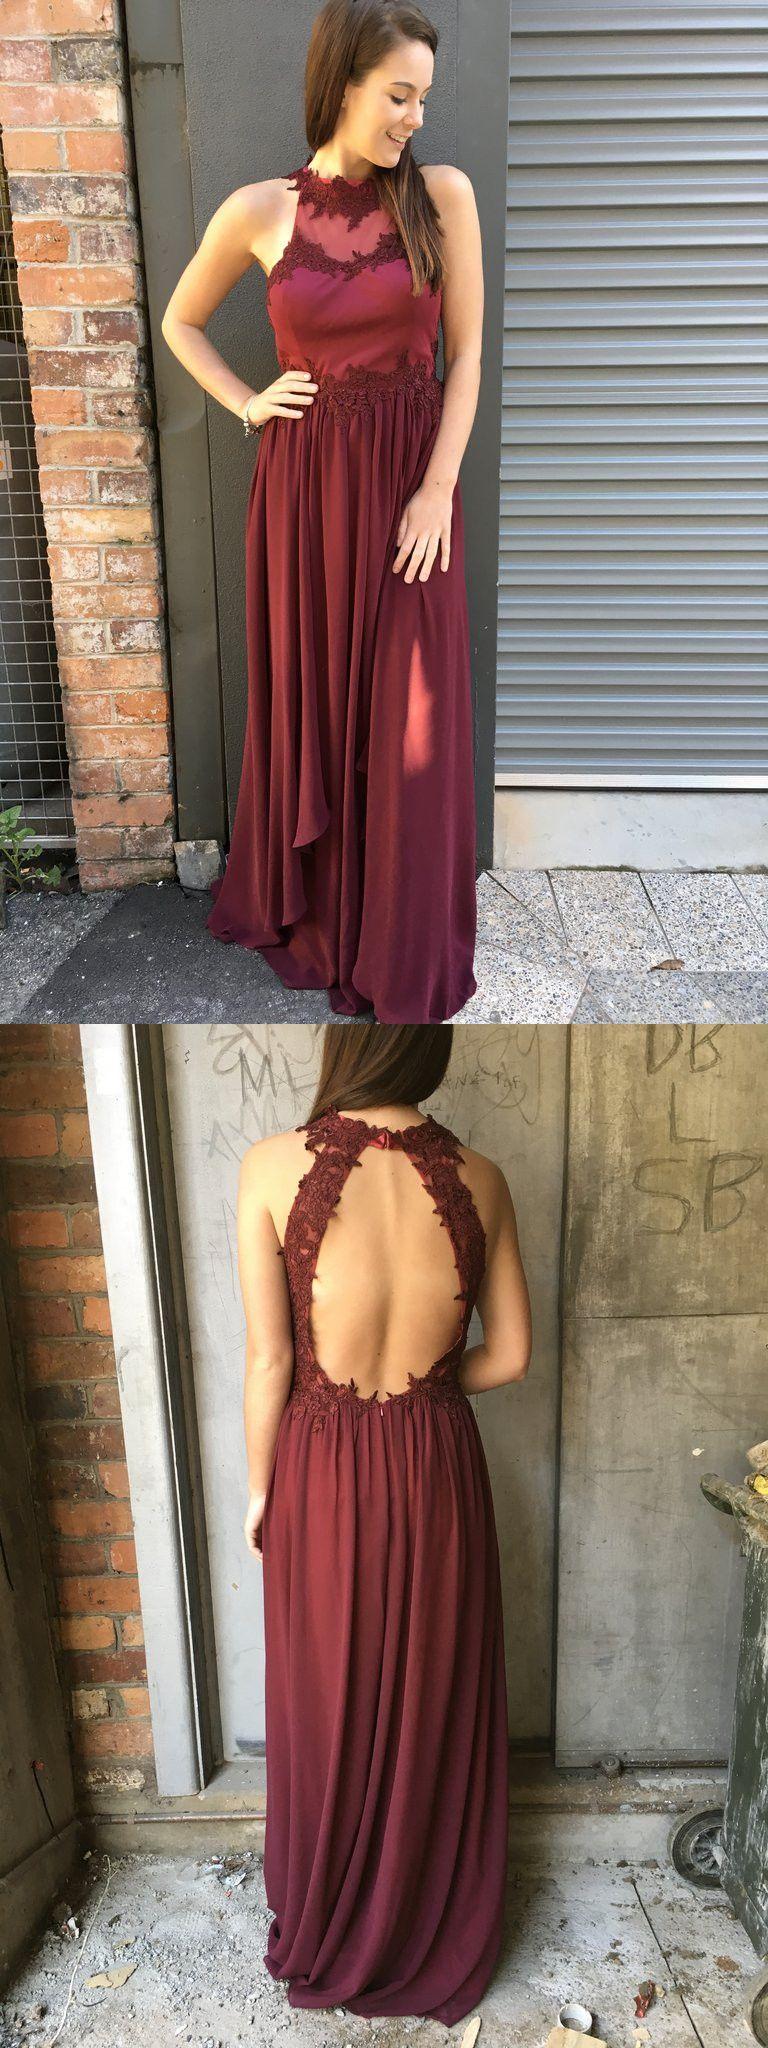 Burgundy long prom dress chiffon long prom dress with side slit